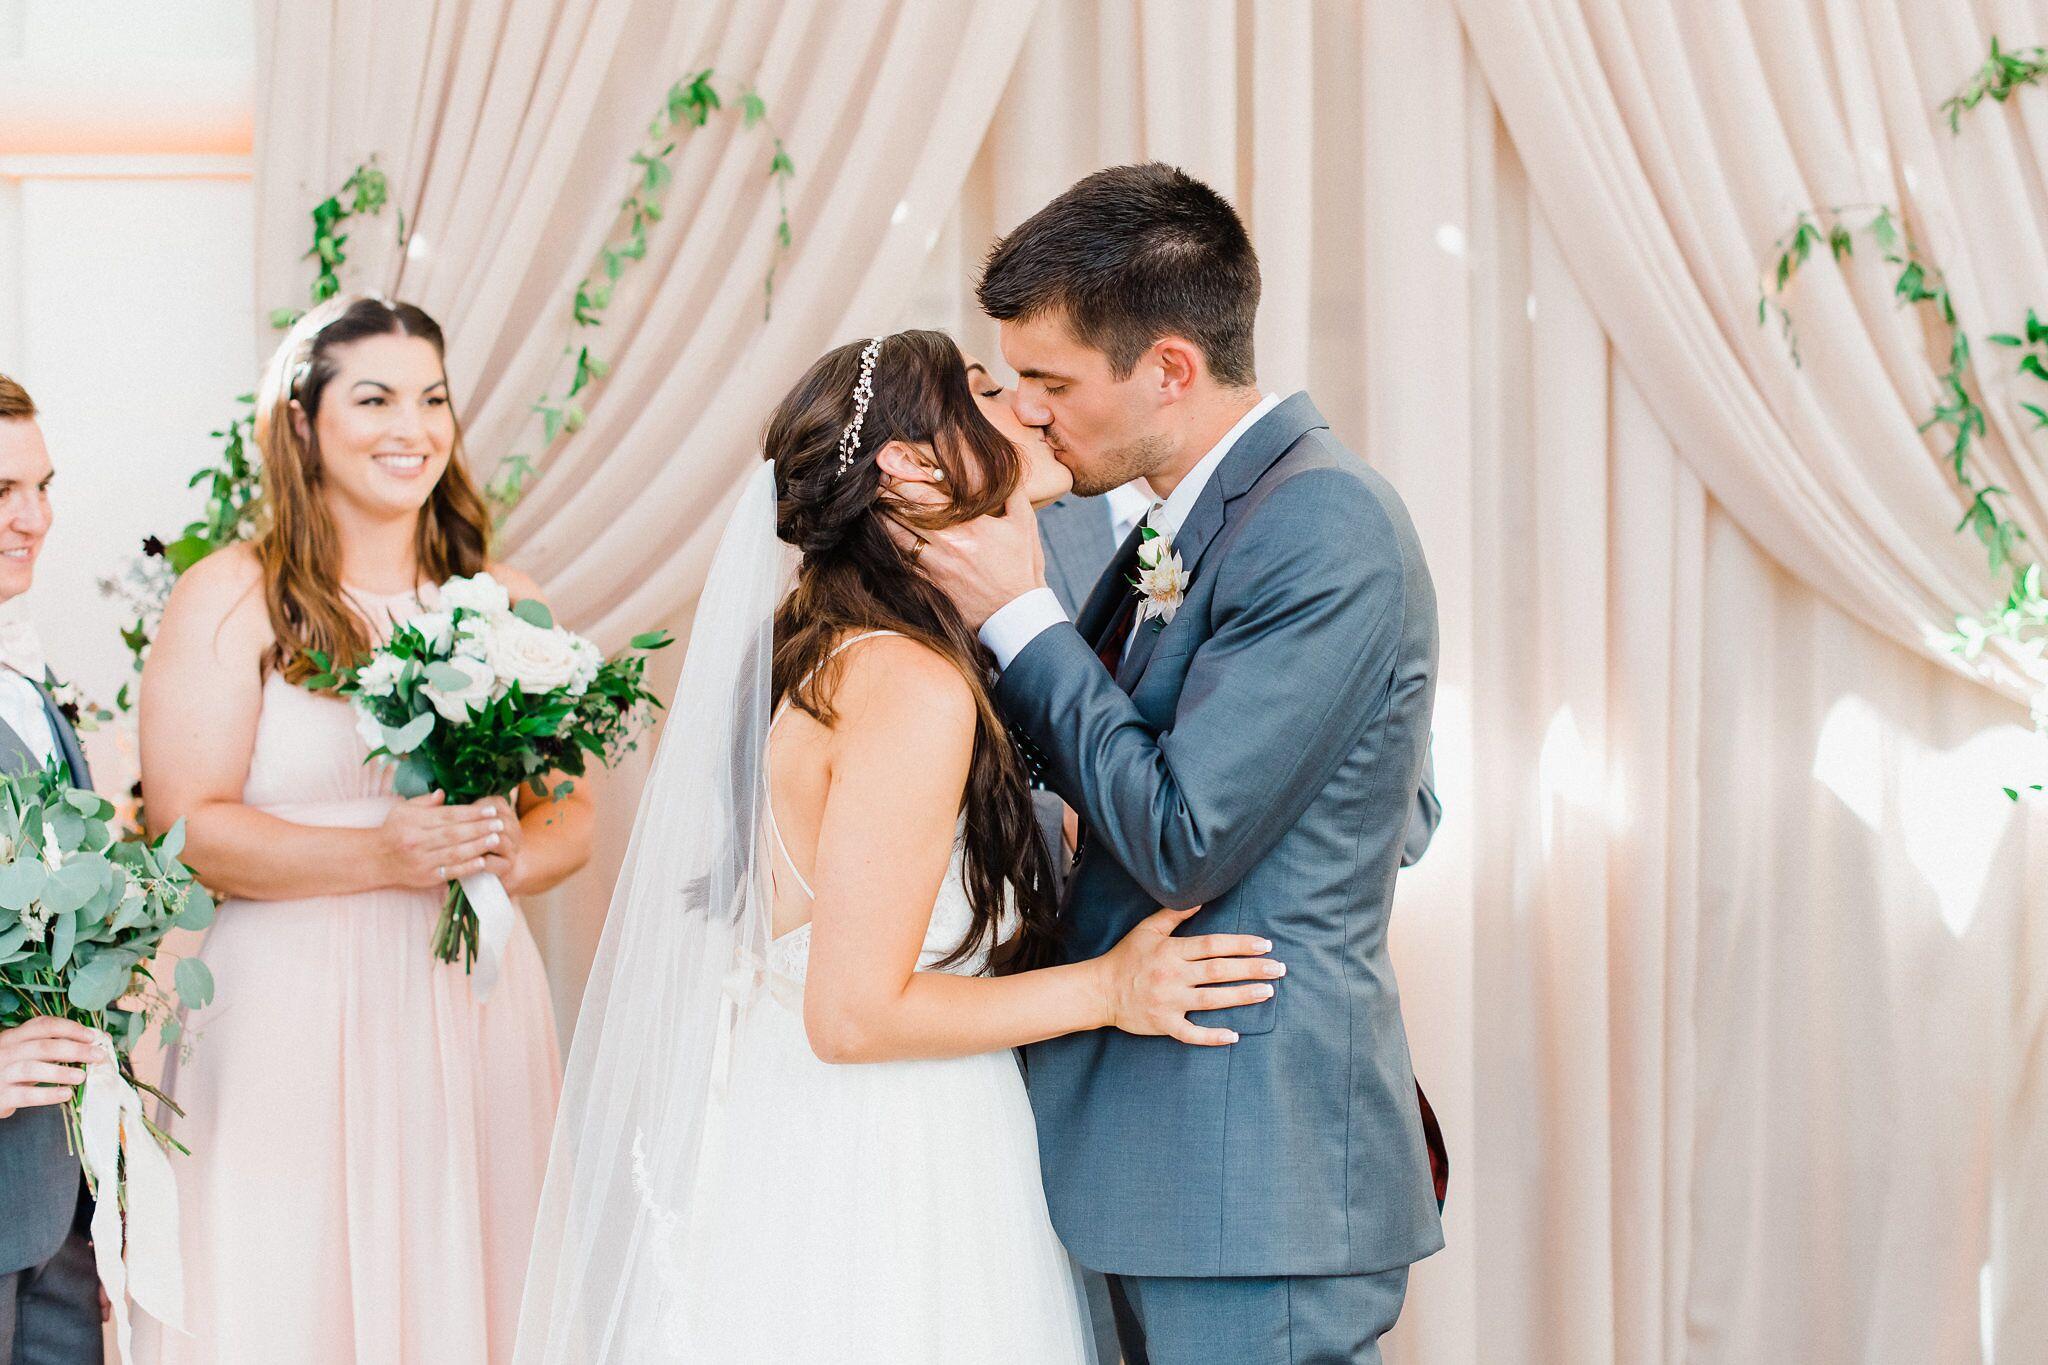 www.santabarbaraweddings.com | Photographer: Grace Kathryn | Venues: Villa & Vine, Santa Barbara Courthouse, Hilton Santa Barbara Resort | Coordination: Burlap & Bordeaux | First Kiss